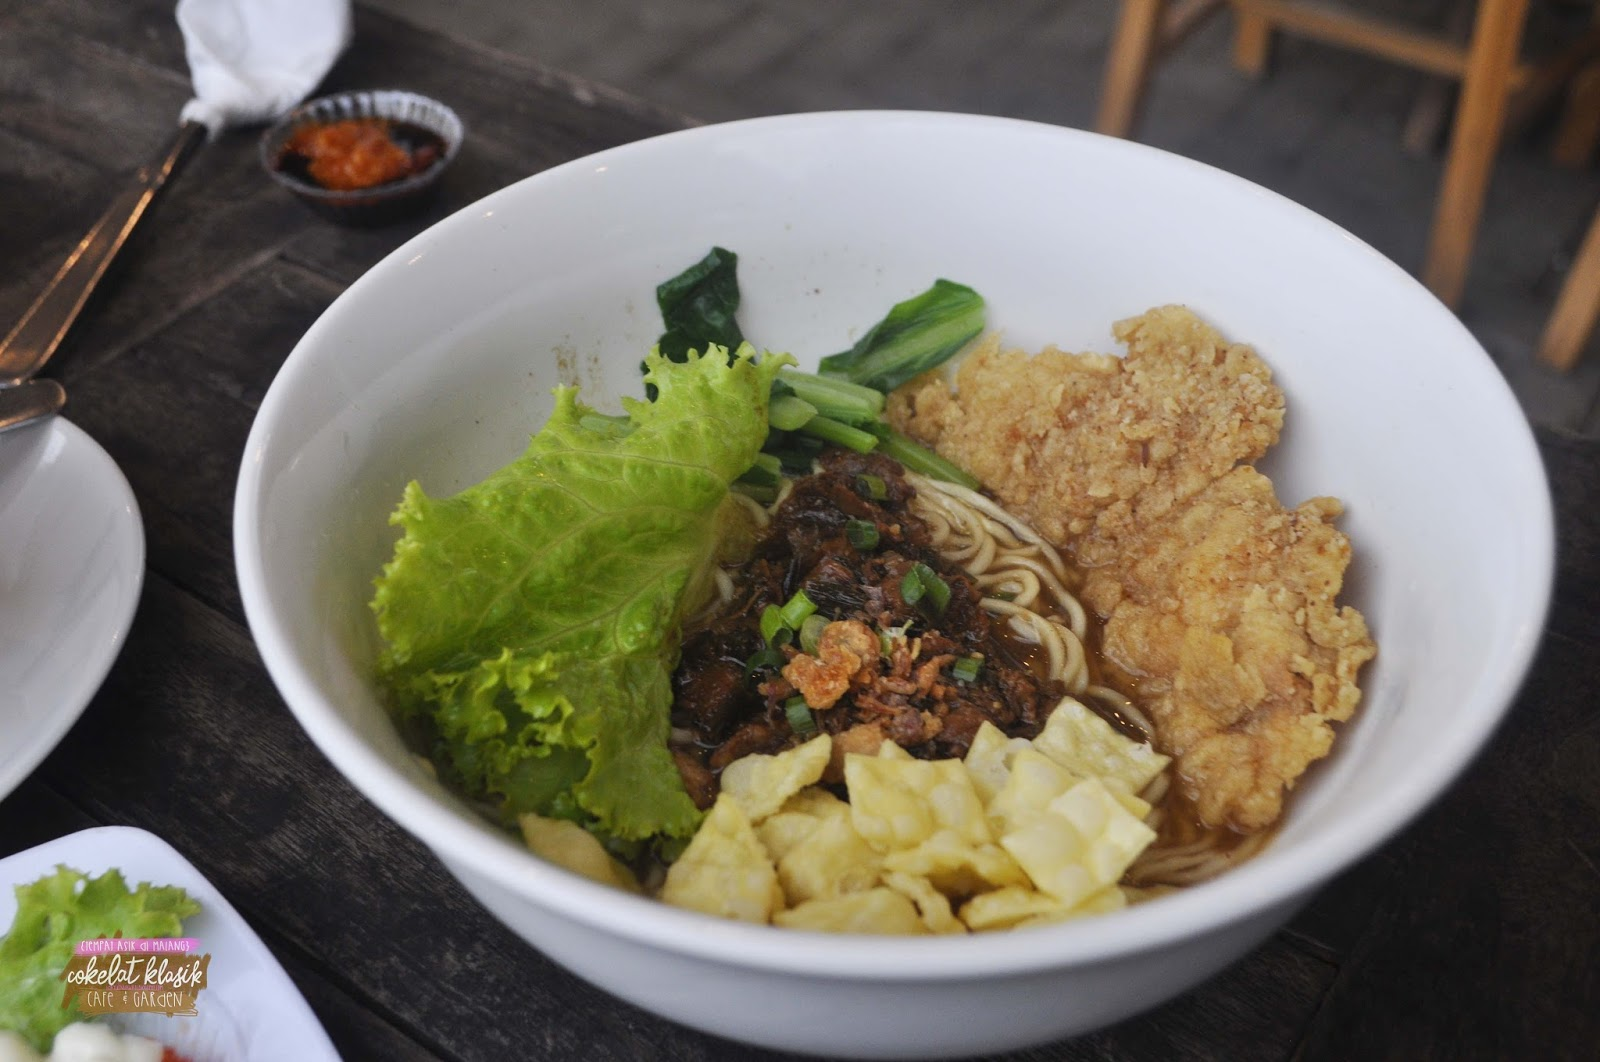 Dream Big Tempat Asik Di Malang Cokelat Klasik Cafe Garden Grapari Halo 12 Bulan Mie Ayam Krispy